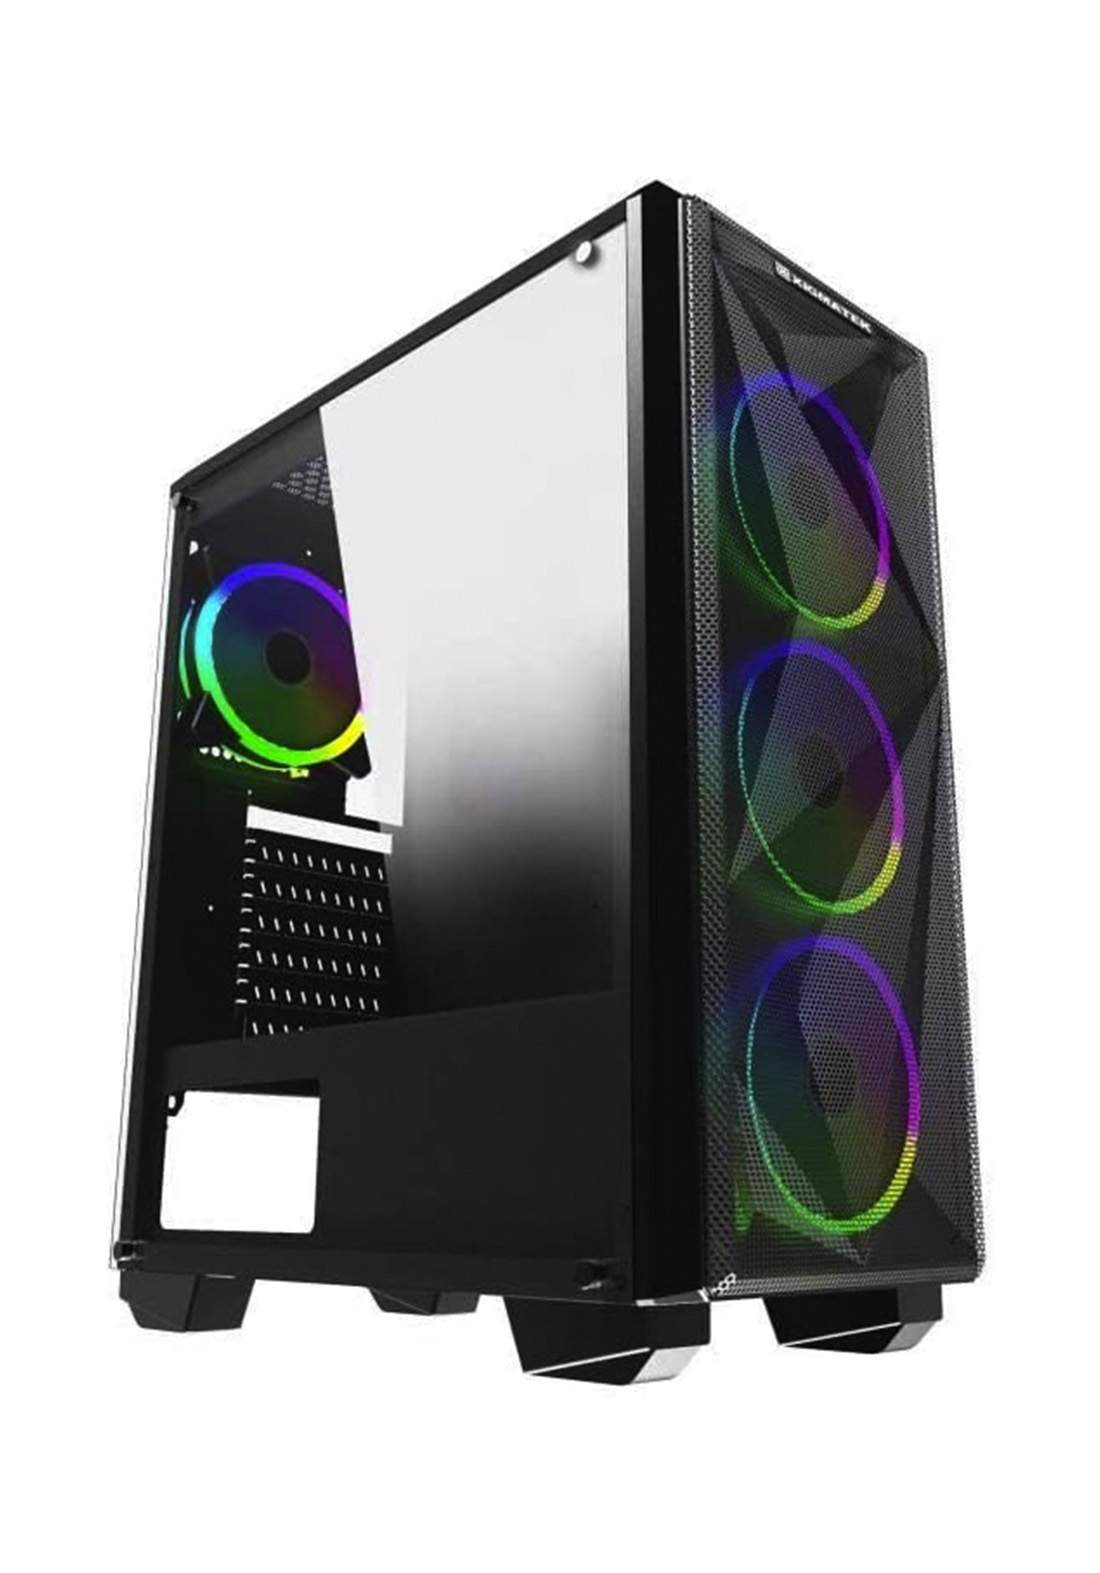 Xigmatek Beast Rgb Medium Tower Atx - Black كيس حاسبة